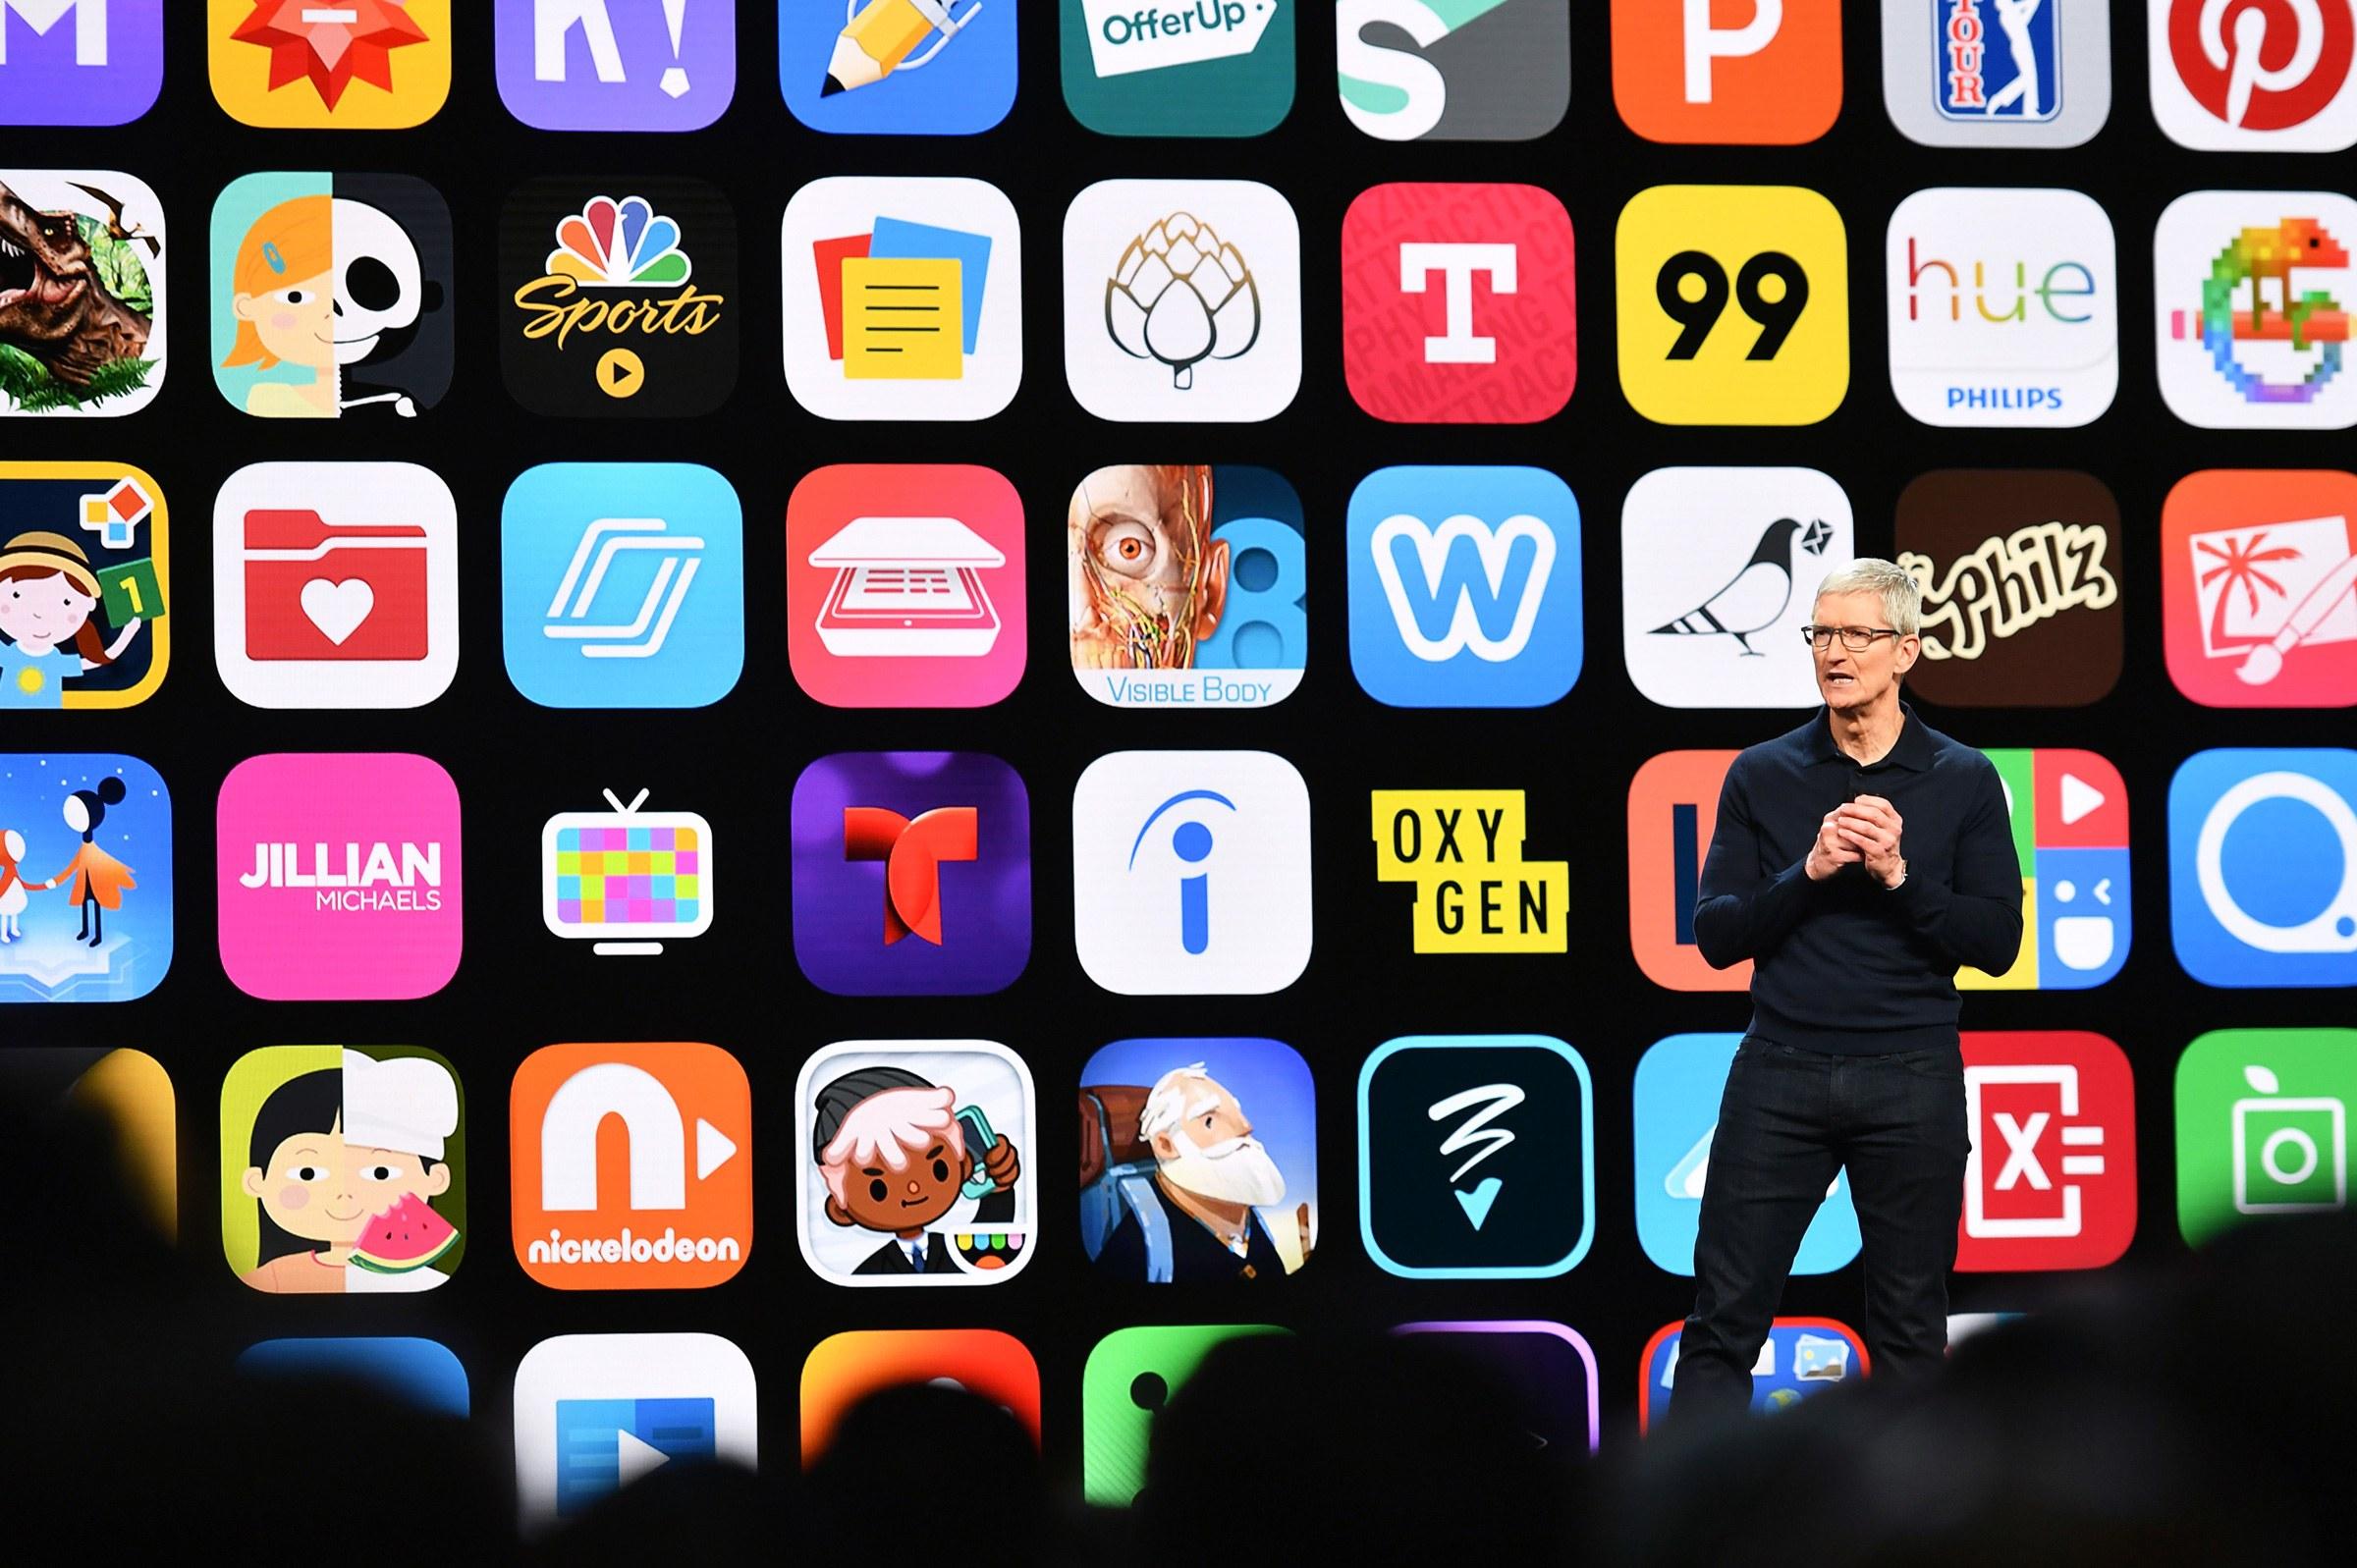 App Store của Apple thu về 50 tỉ USD lợi nhuận